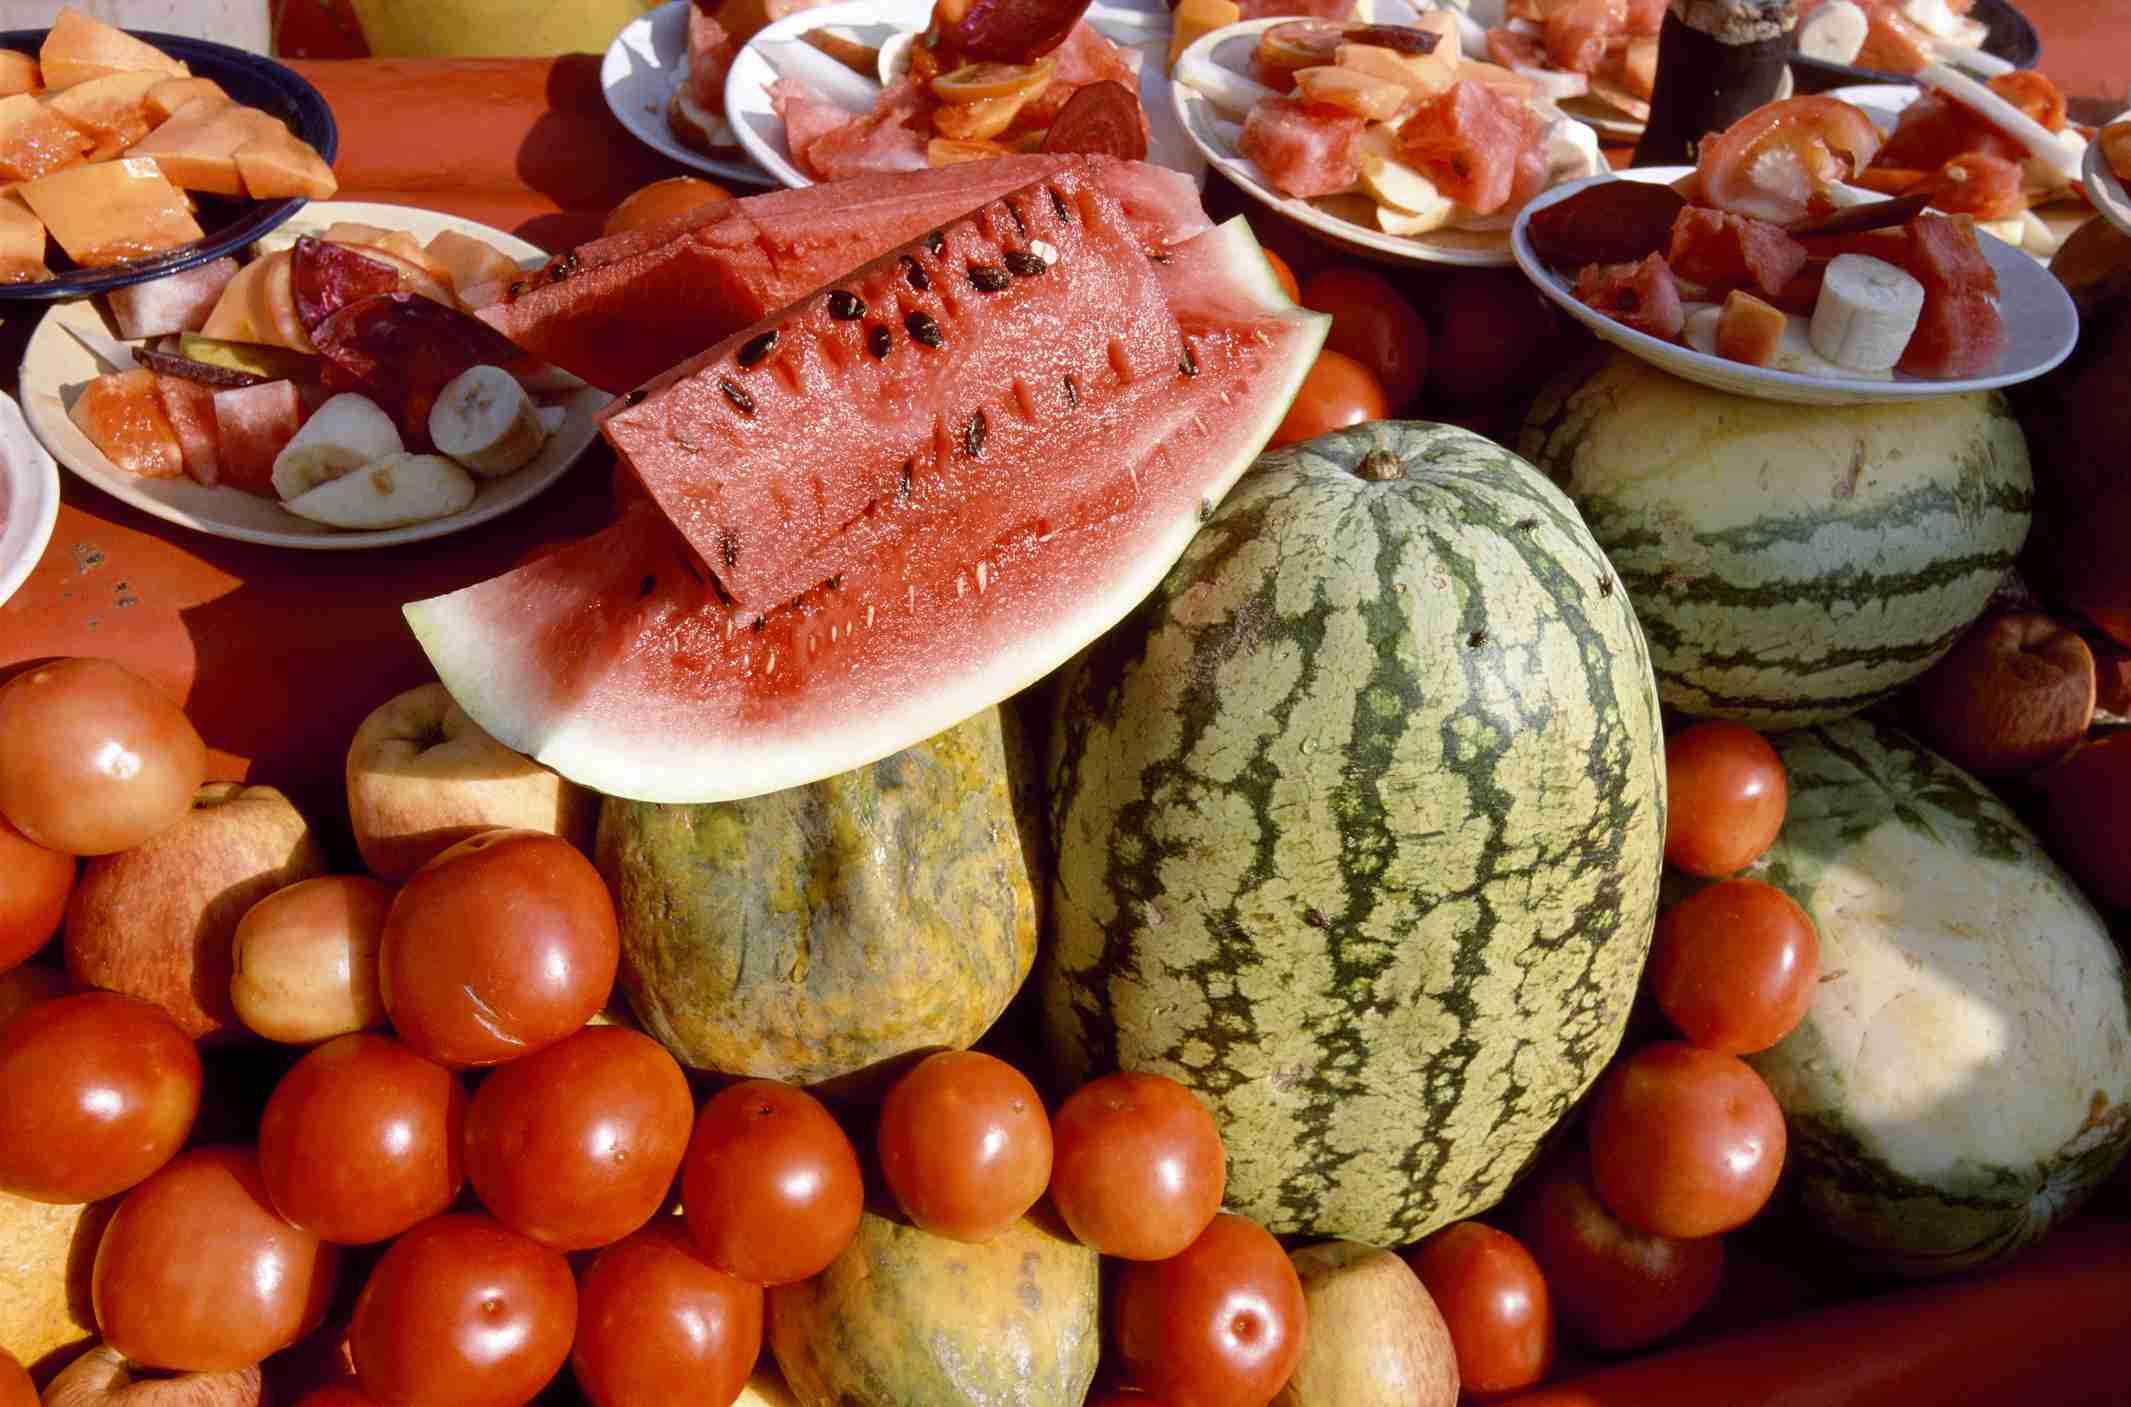 Close-up of fruits at a market stall